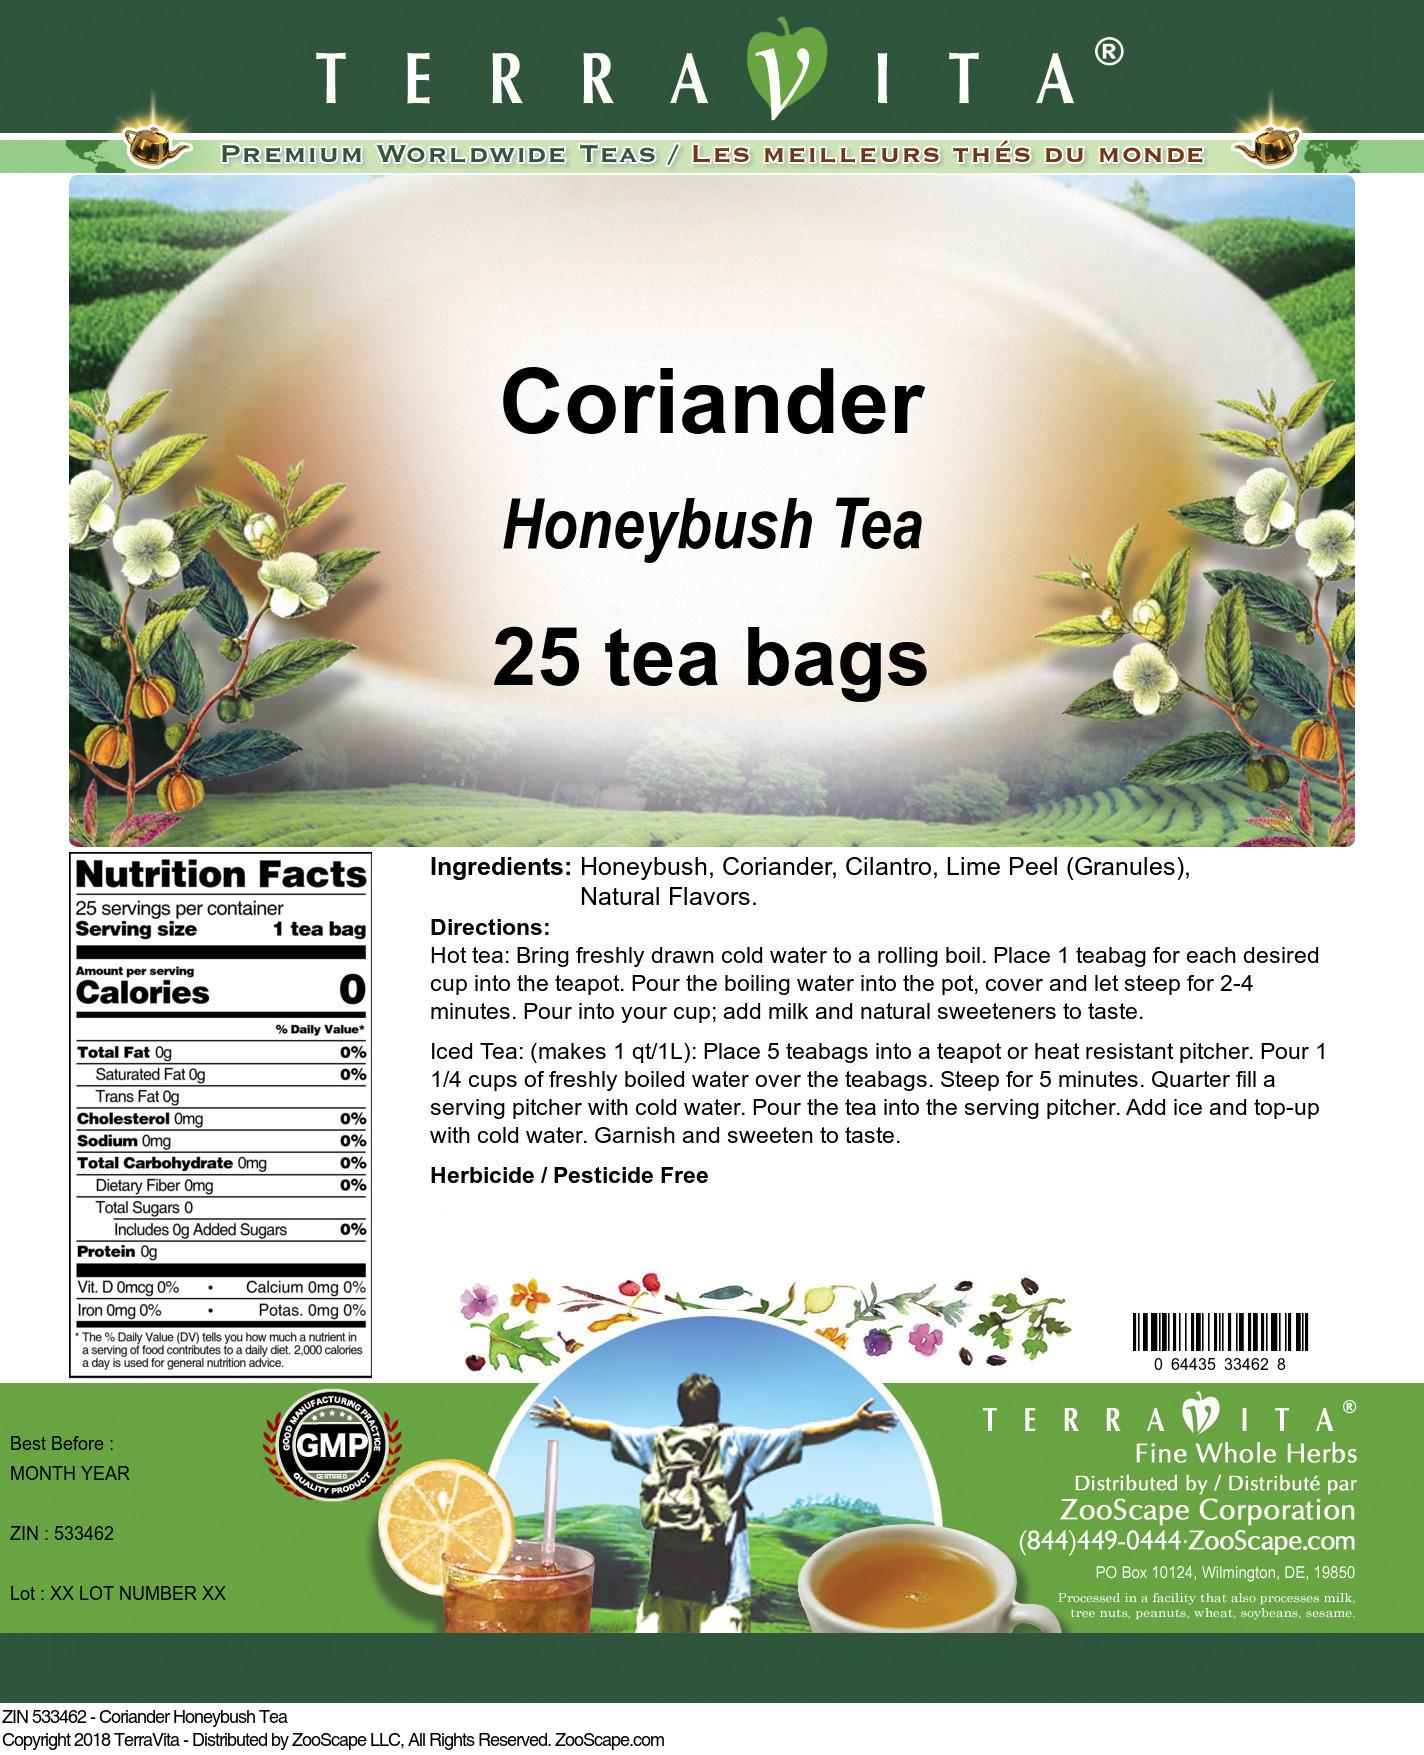 Coriander Honeybush Tea